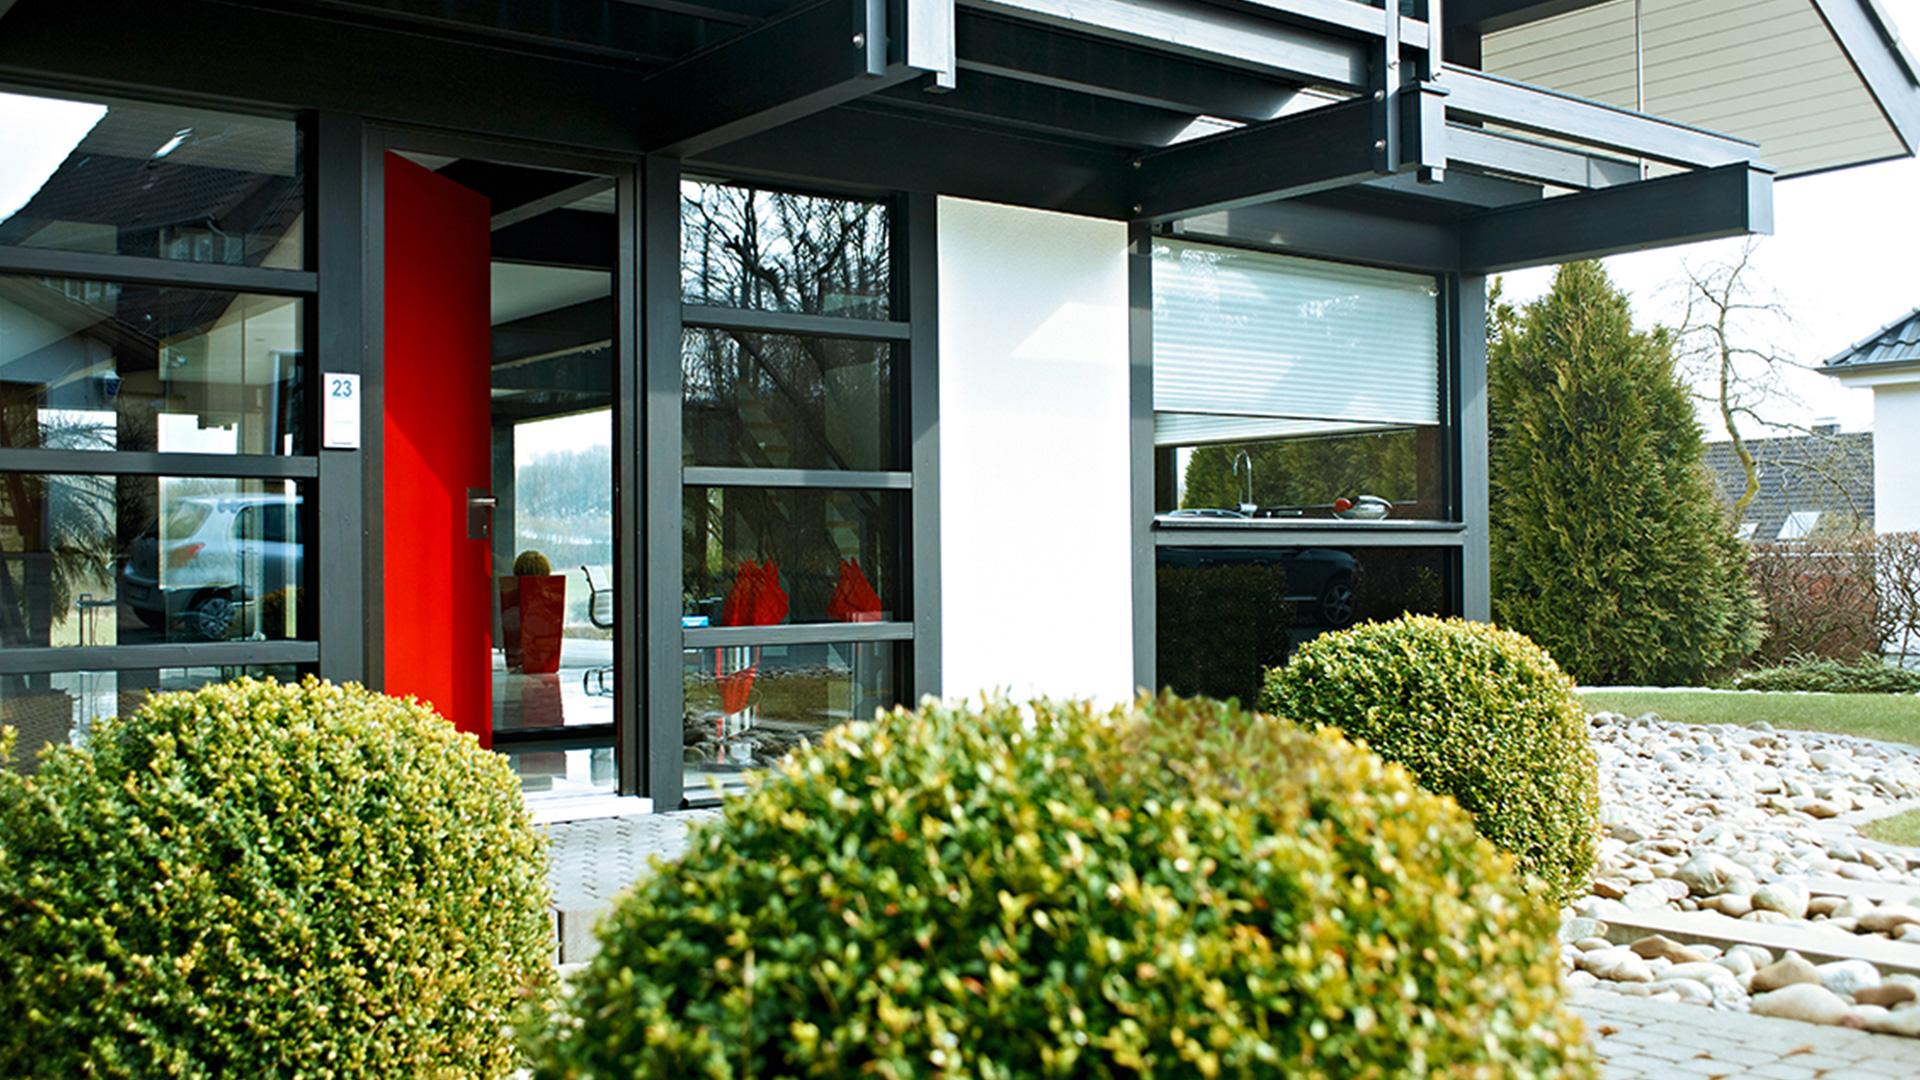 Modernes Fachwerkhaus | Detmolder Fachwerkhaus | Corona-Krise